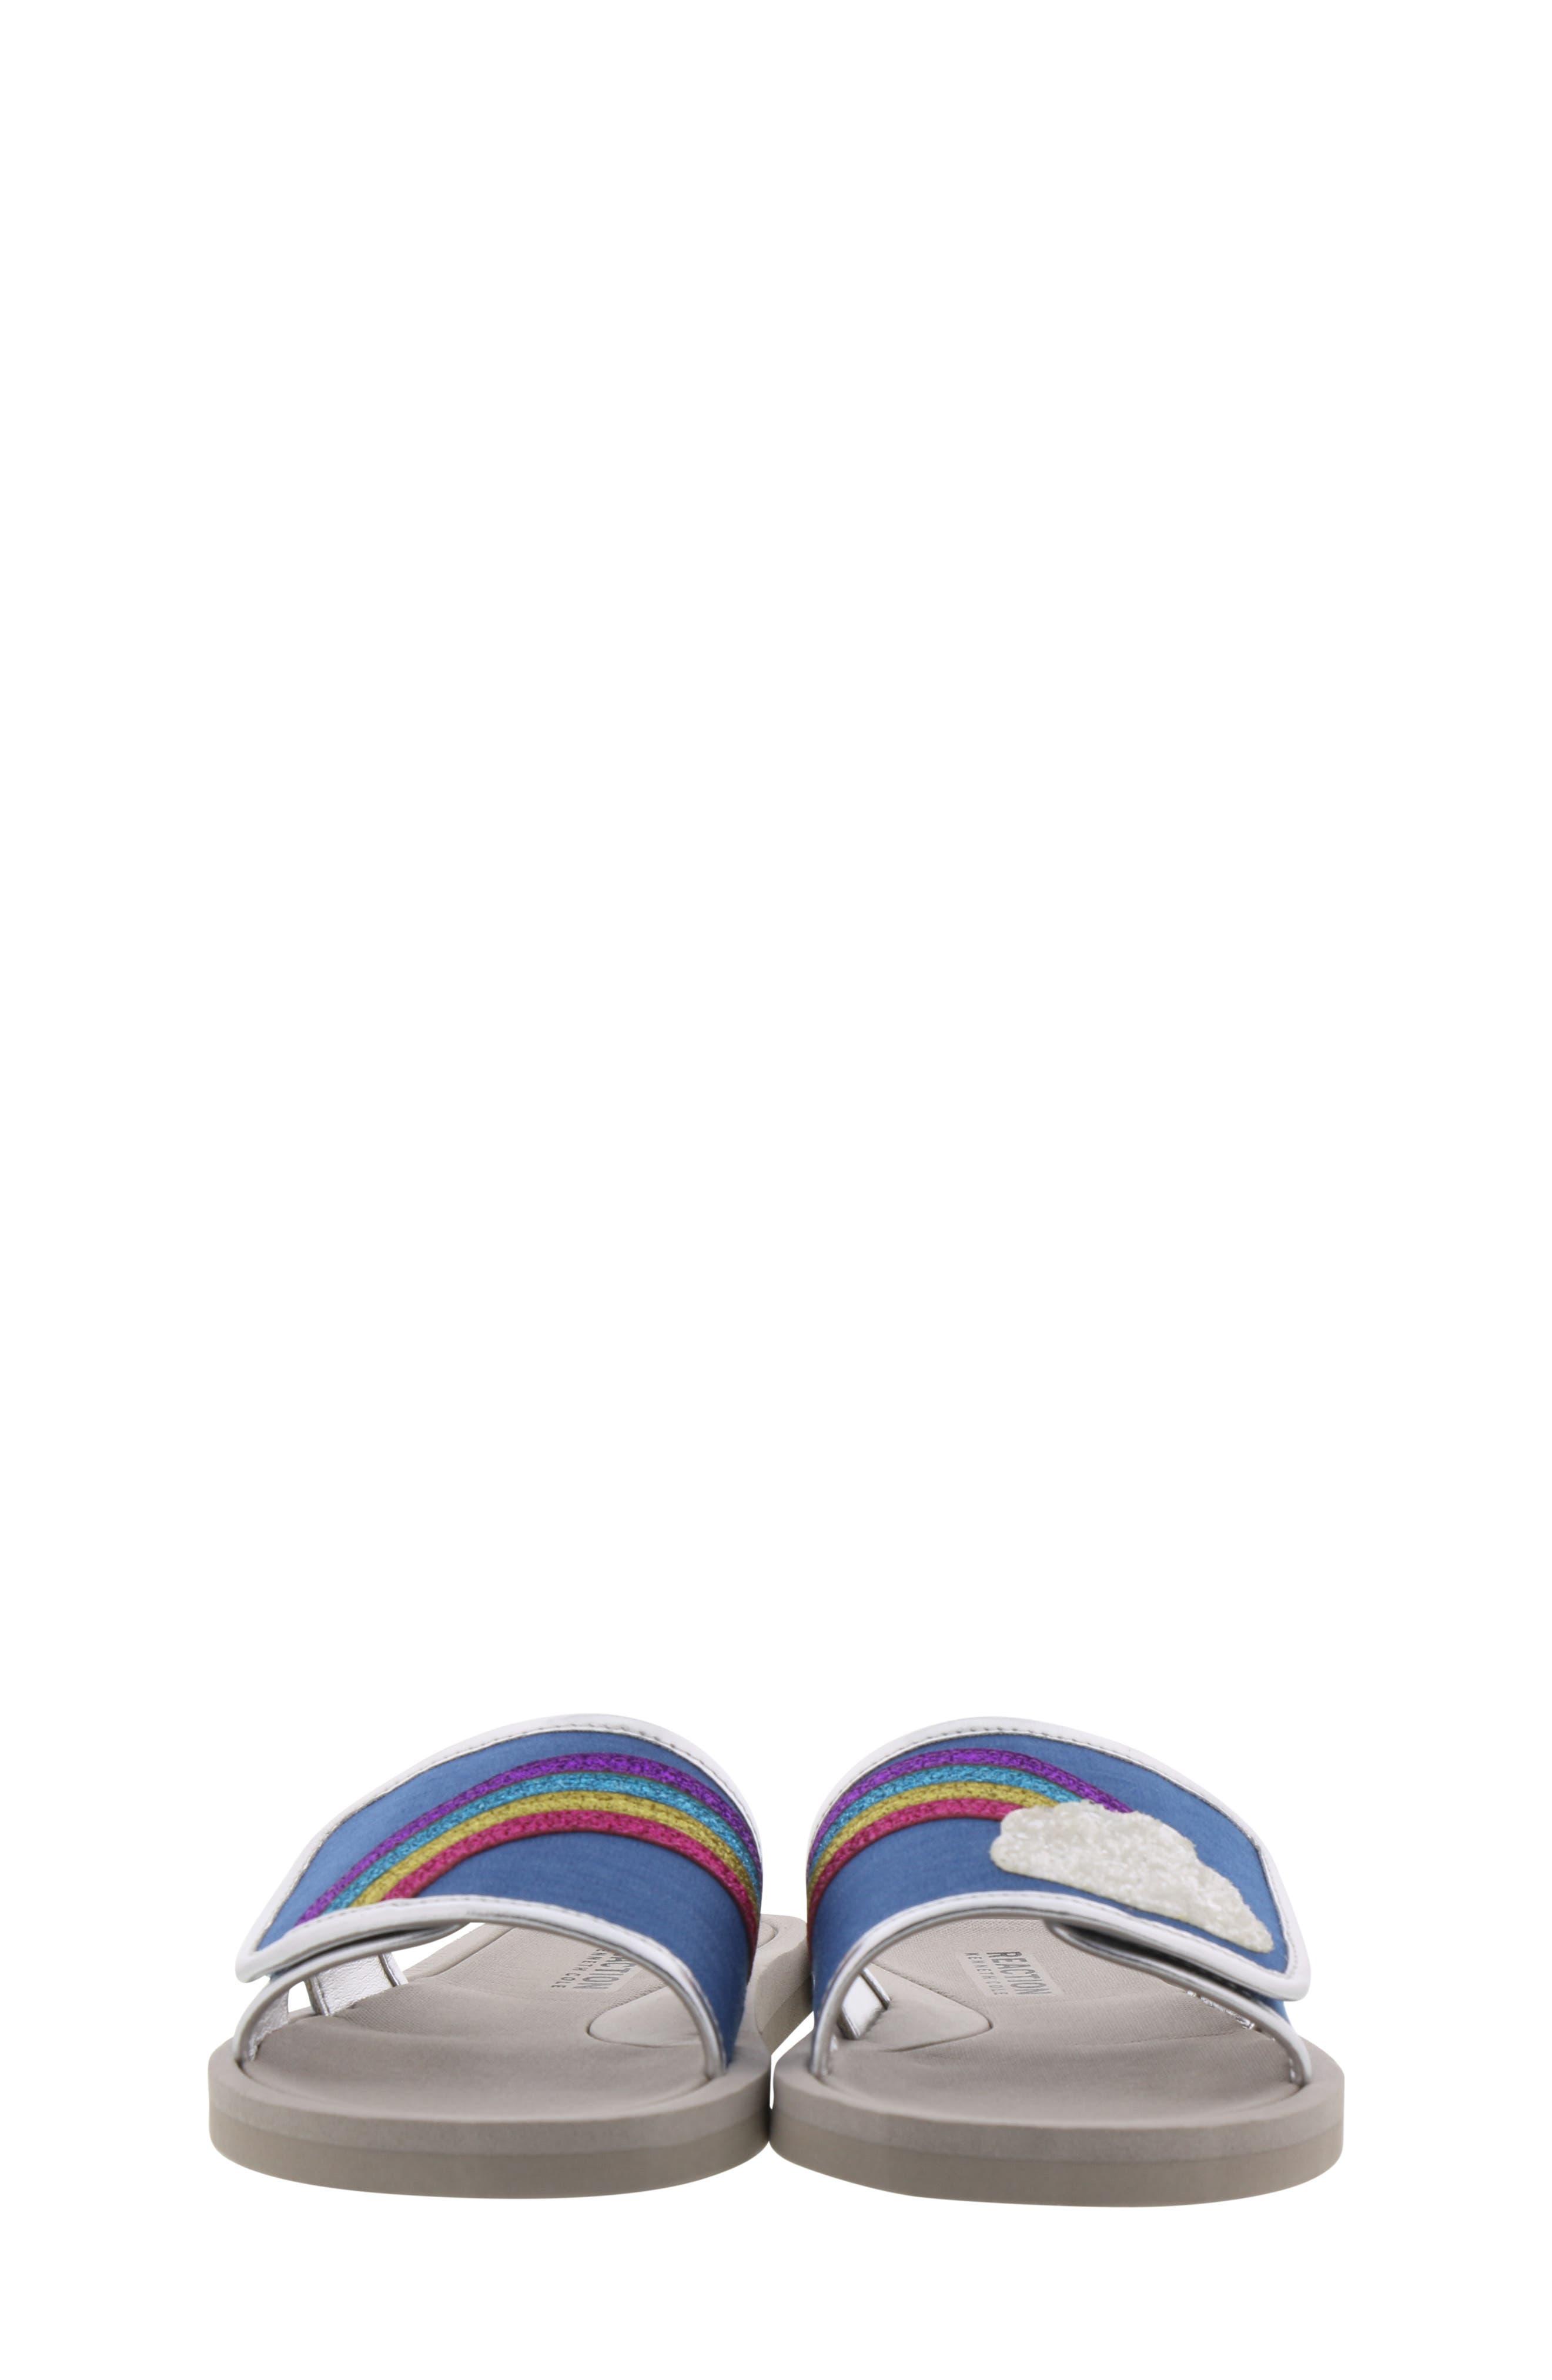 REACTION KENNETH COLE, Elise Karla Rainbow Slide Sandal, Alternate thumbnail 4, color, DENIM